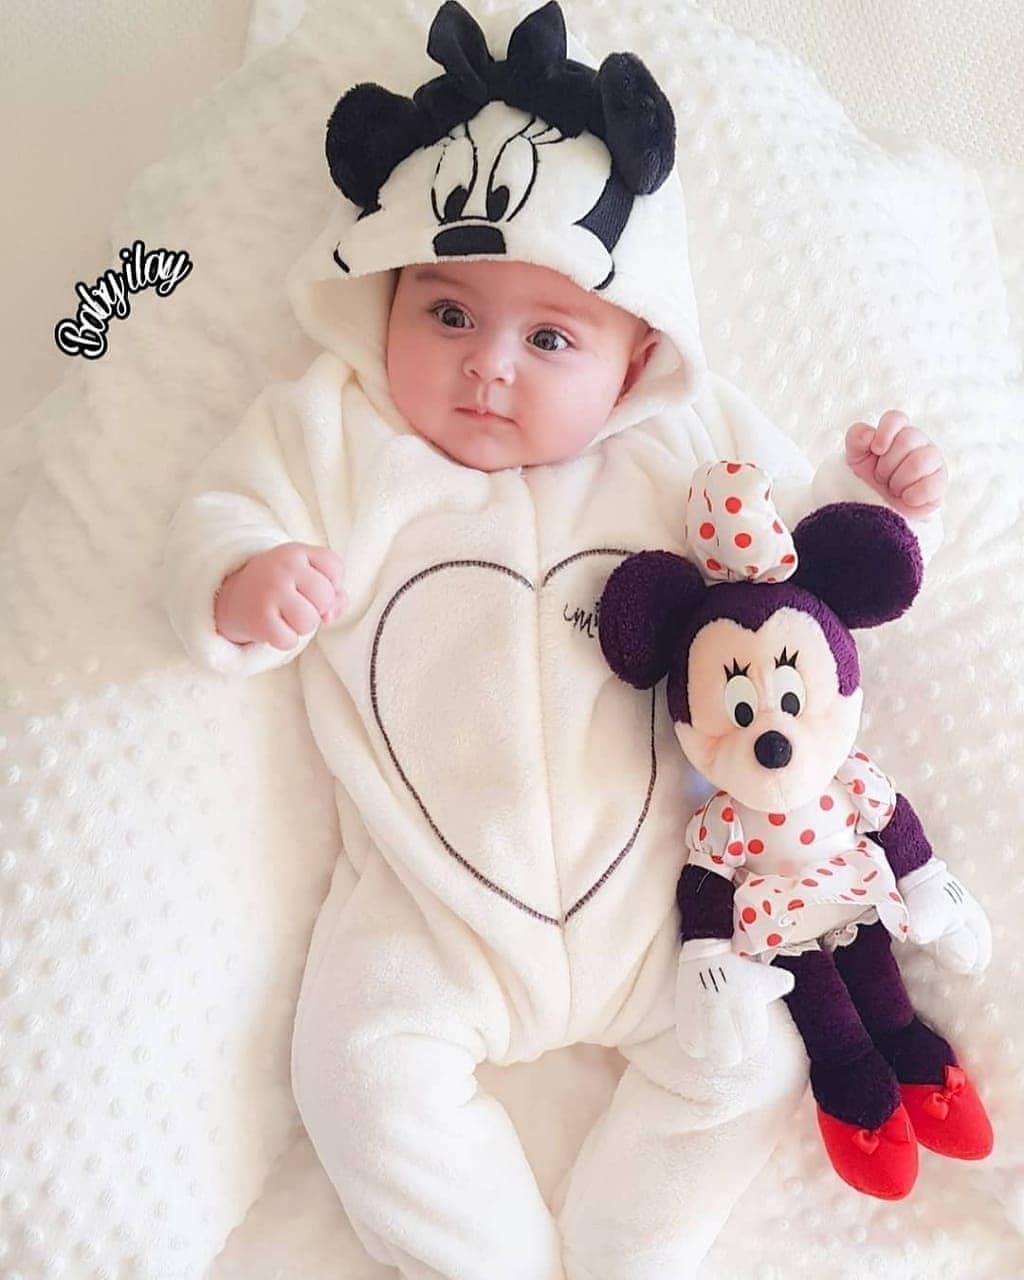 Pin By Manrajpreet Kaur On Cutties Cute Baby Wallpaper Cute Baby Girl Pictures Cute Baby Boy Photos